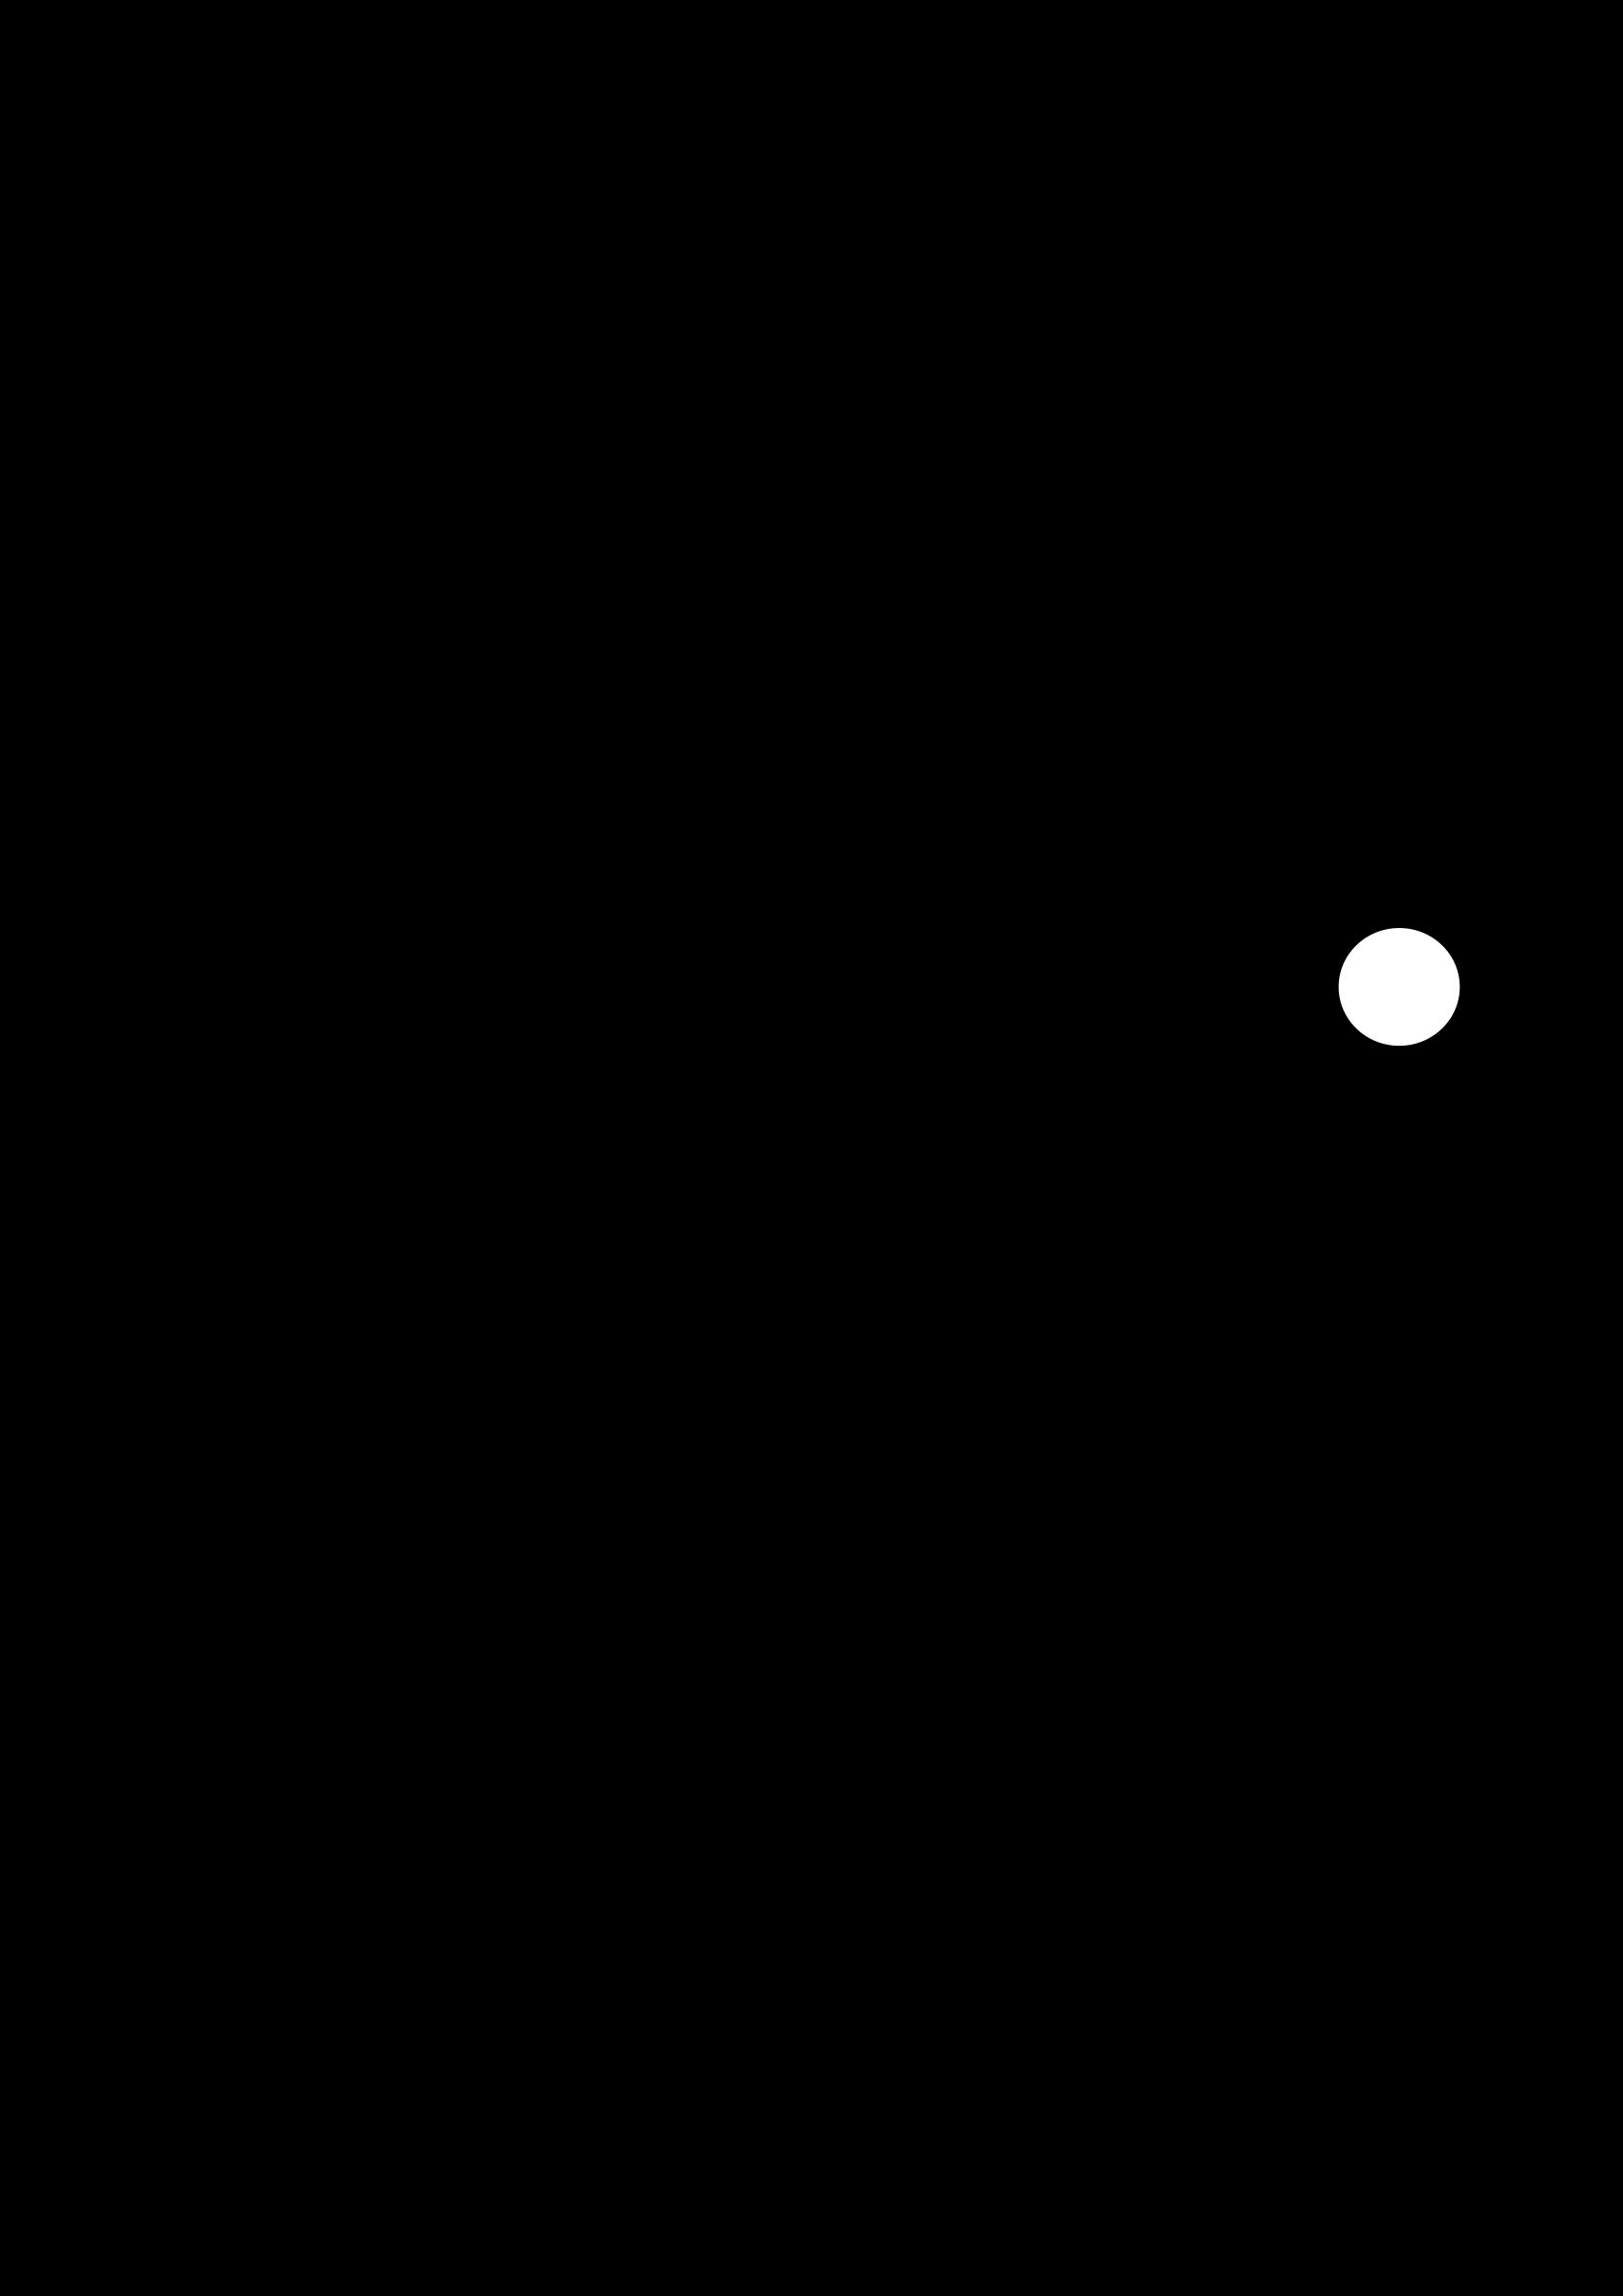 Microscope graphic vector clipart image.